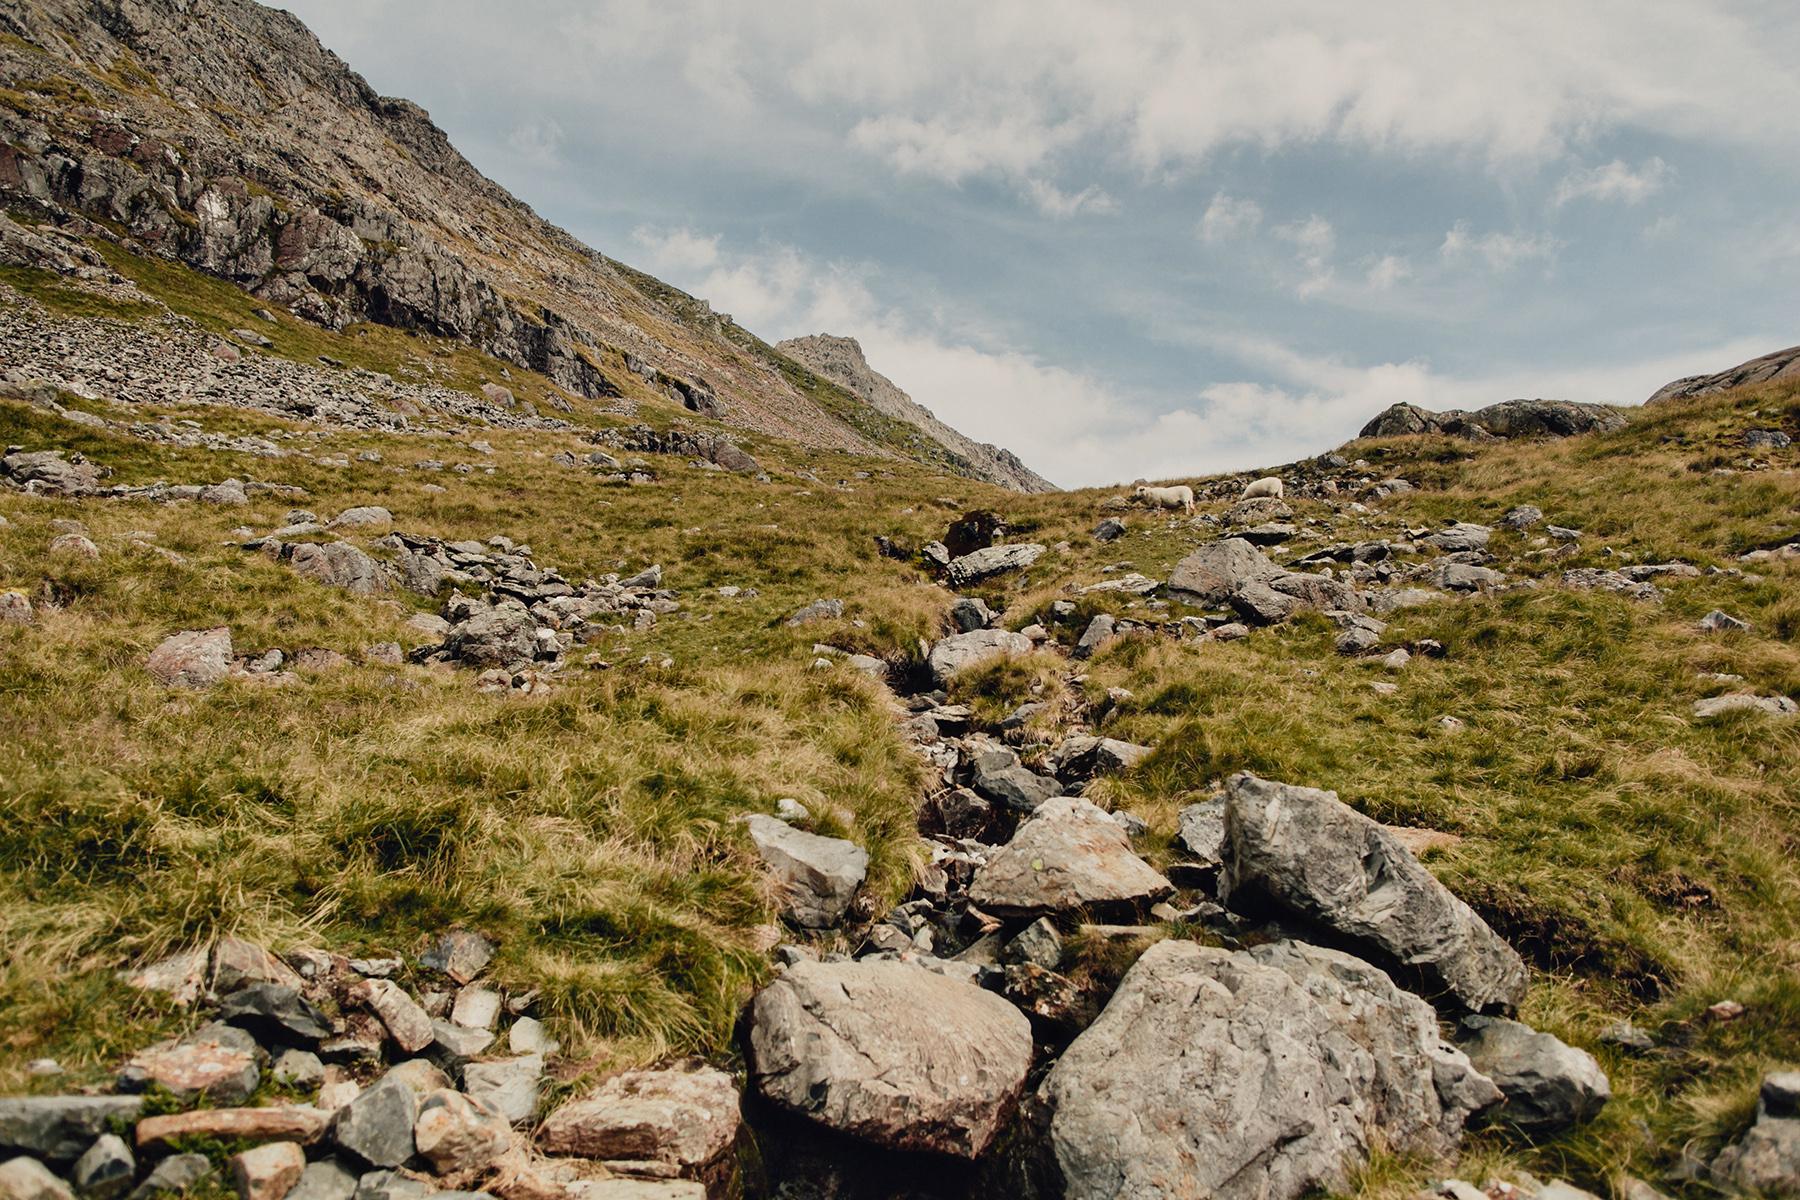 Mt-Snowdon-Hike-Photos-From-Peny-Pass-00081.jpg